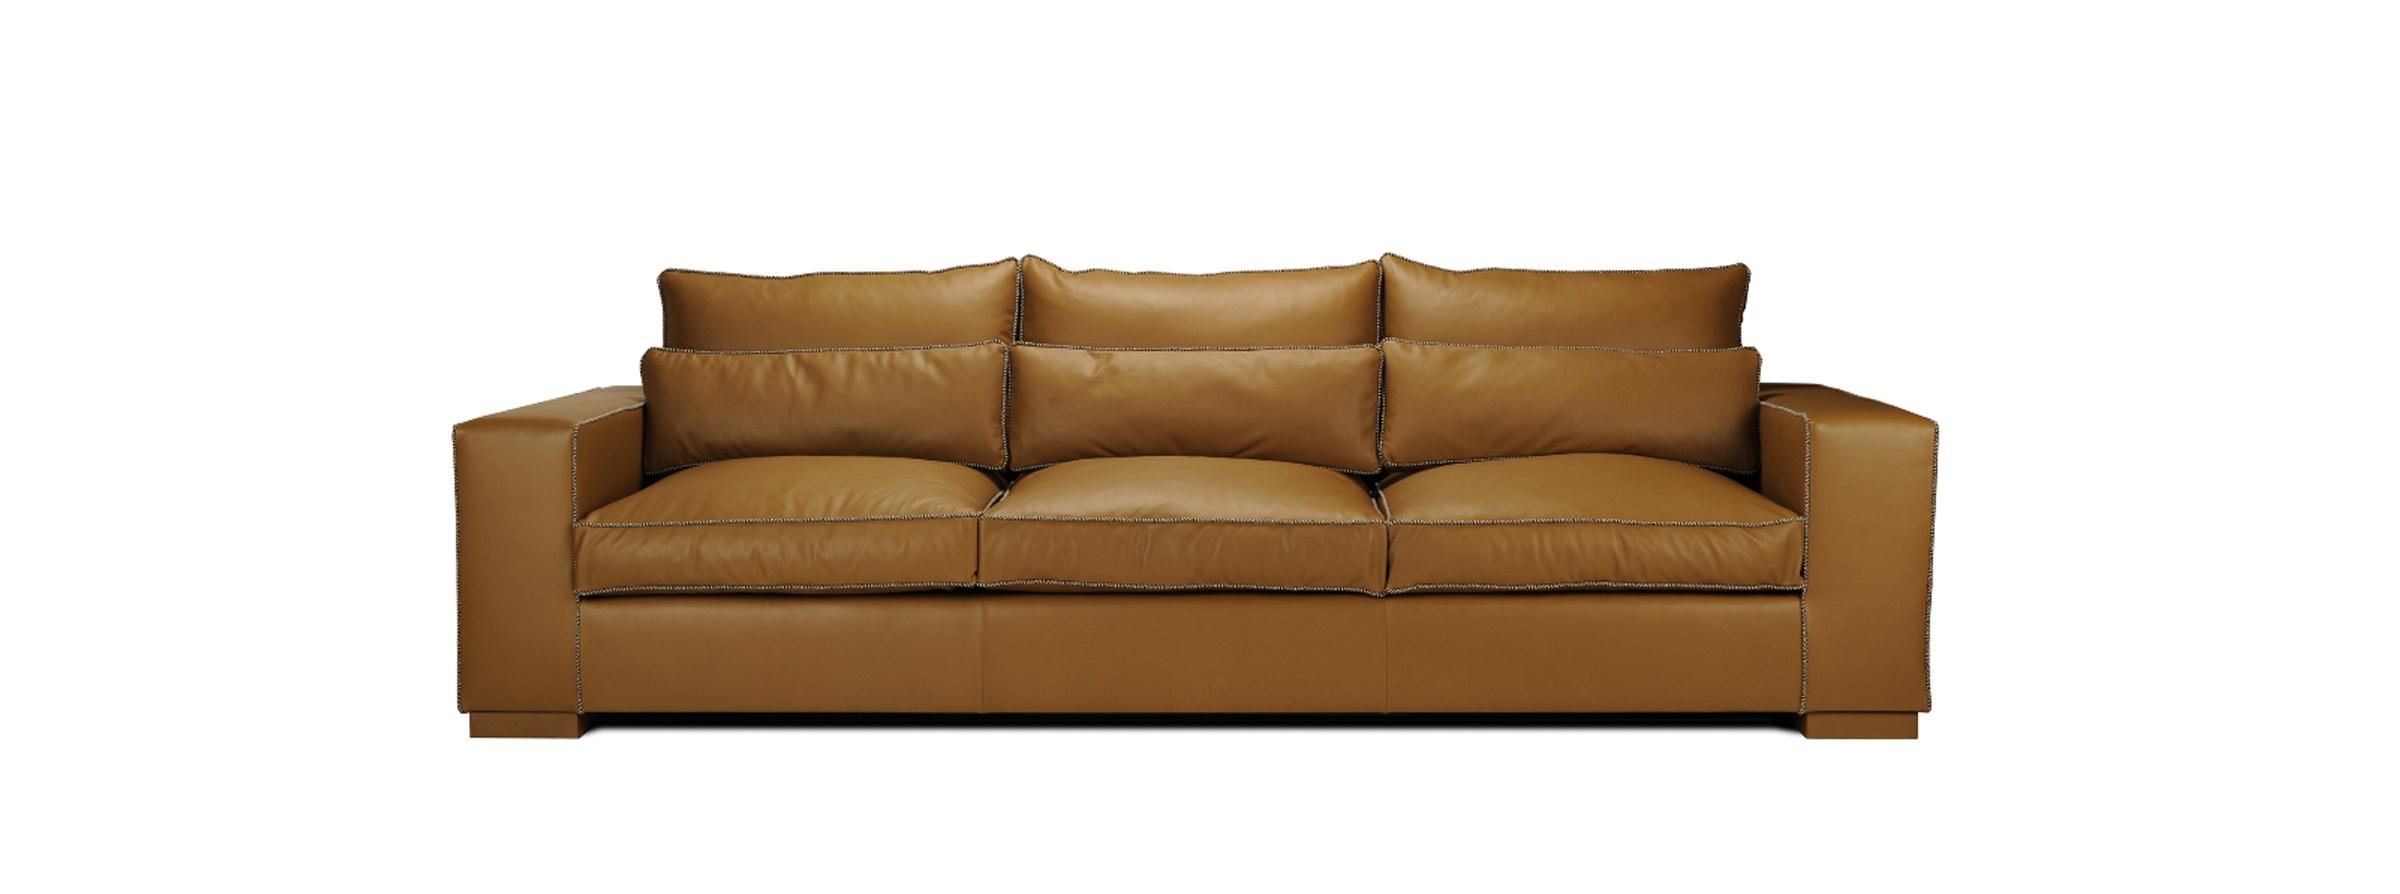 la collection design desio. Black Bedroom Furniture Sets. Home Design Ideas